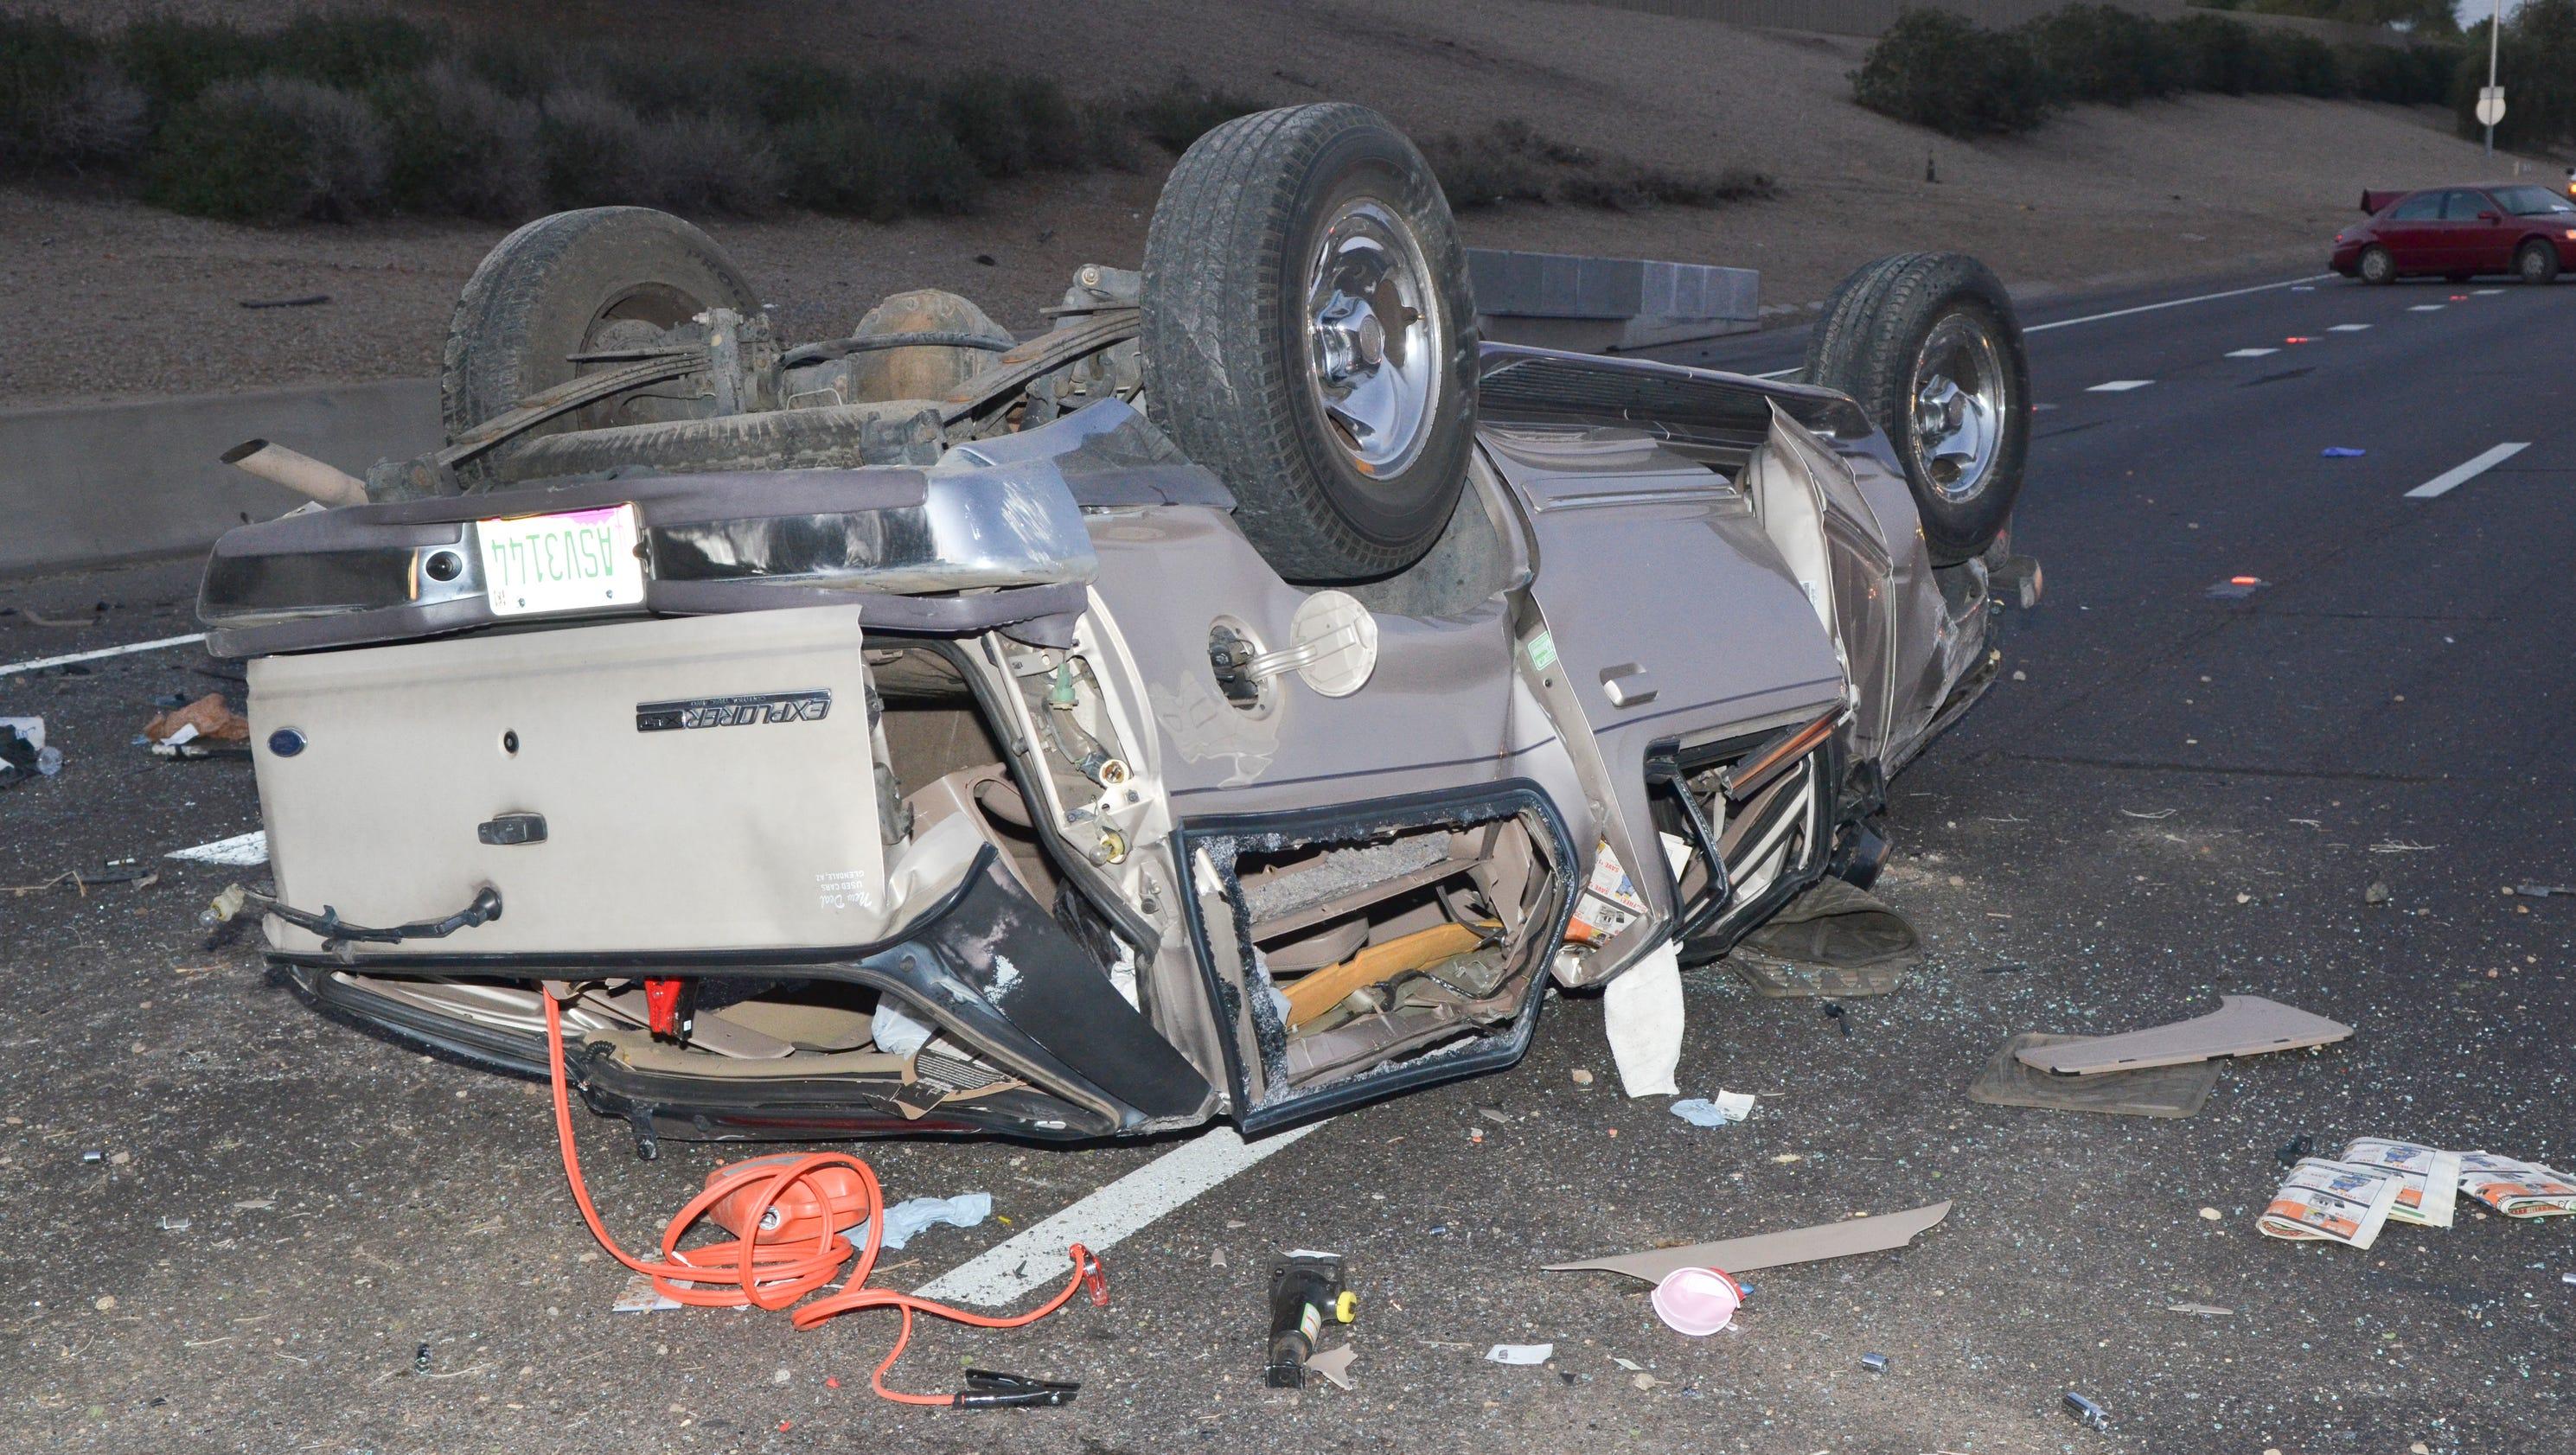 DPS identifies 2 killed in wrong-way crash in southeast Phoenix